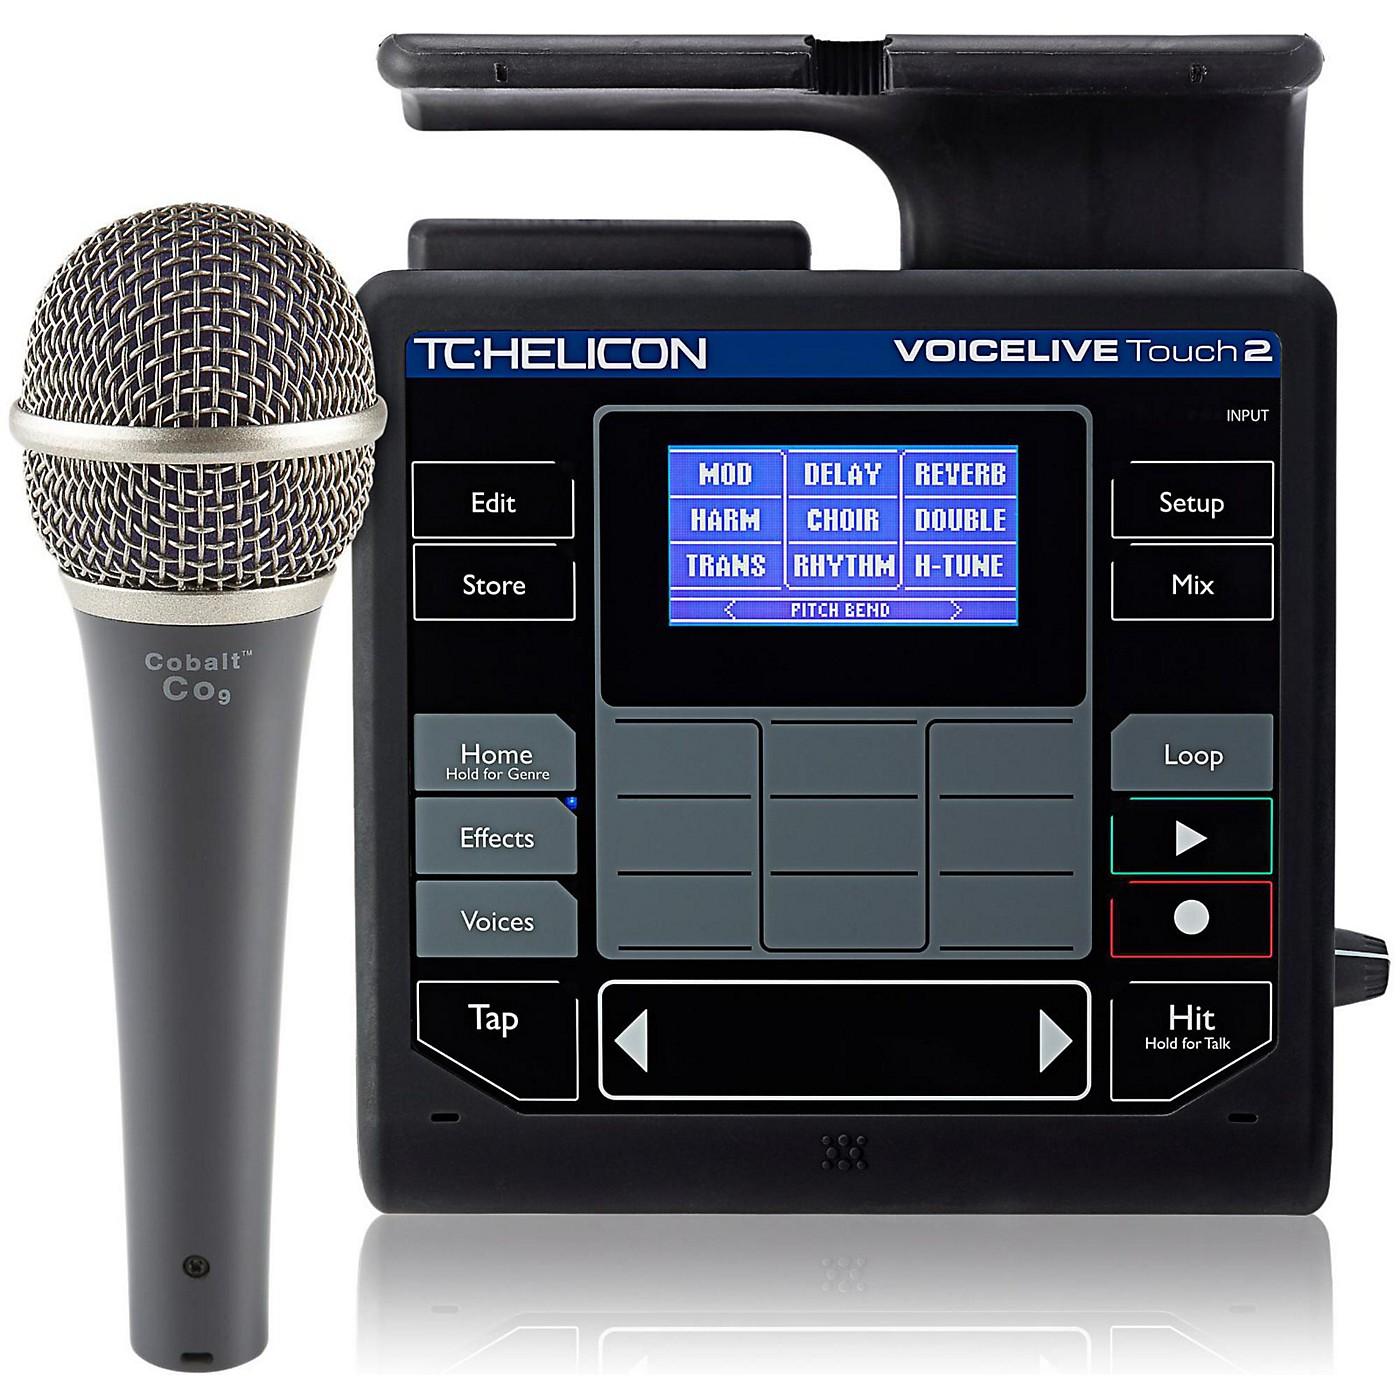 TC Helicon VoiceLive Touch 2 with Cobalt CO9 Mic Bundle thumbnail